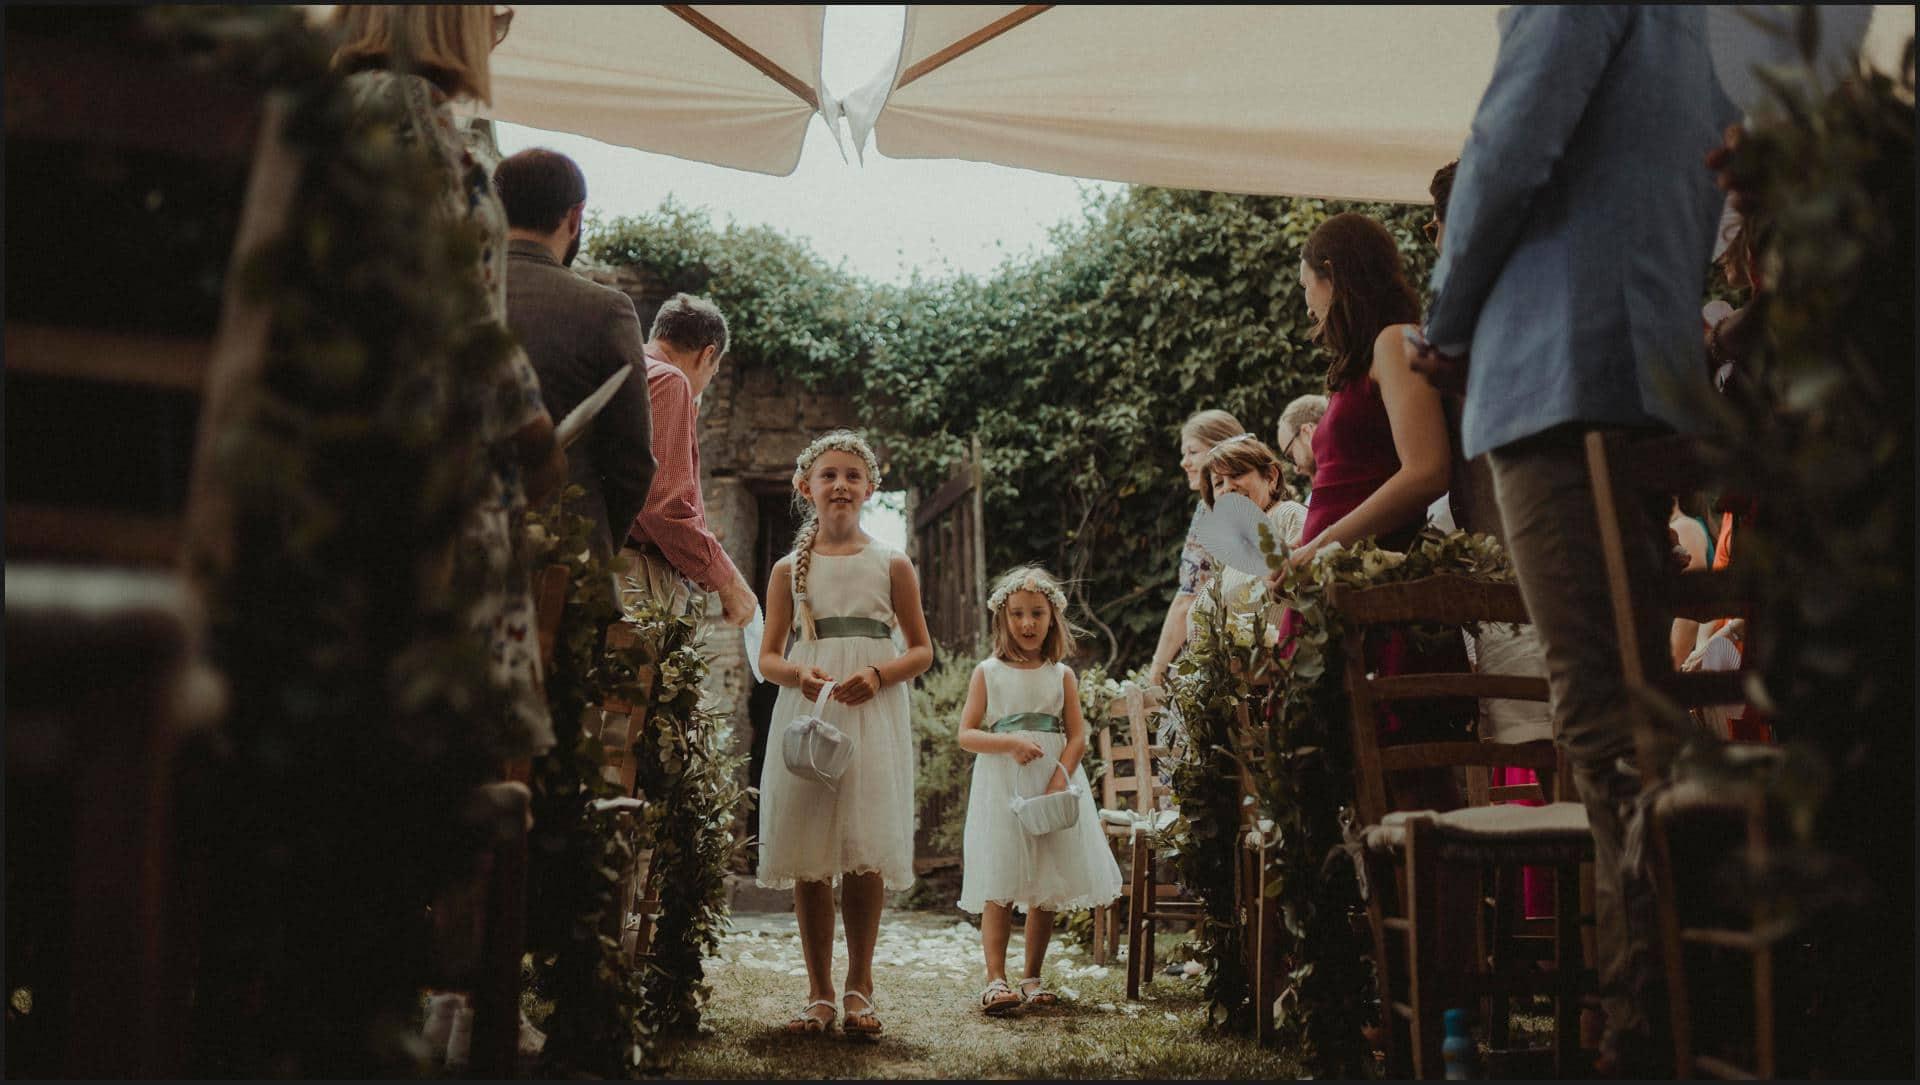 borgo di tragliata, wedding, rome, wedding in rome, ceremony, italy wedding, wedding photographer